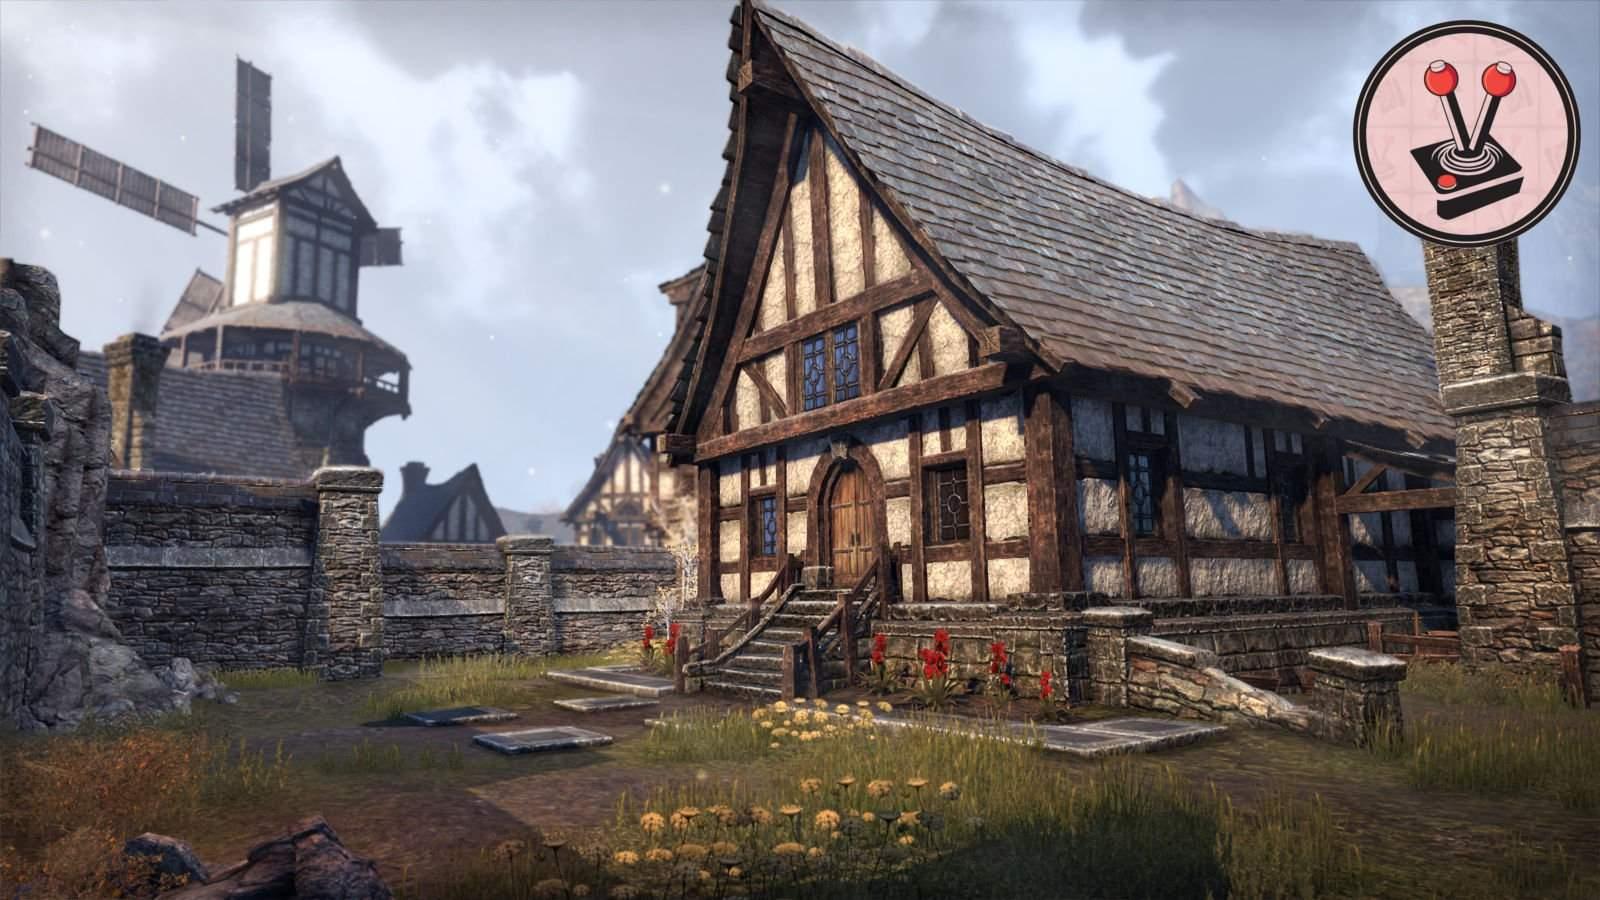 Vamers - FYI - Video Gaming - The Elder Scrolls gets player housing in new Homestead update - 05